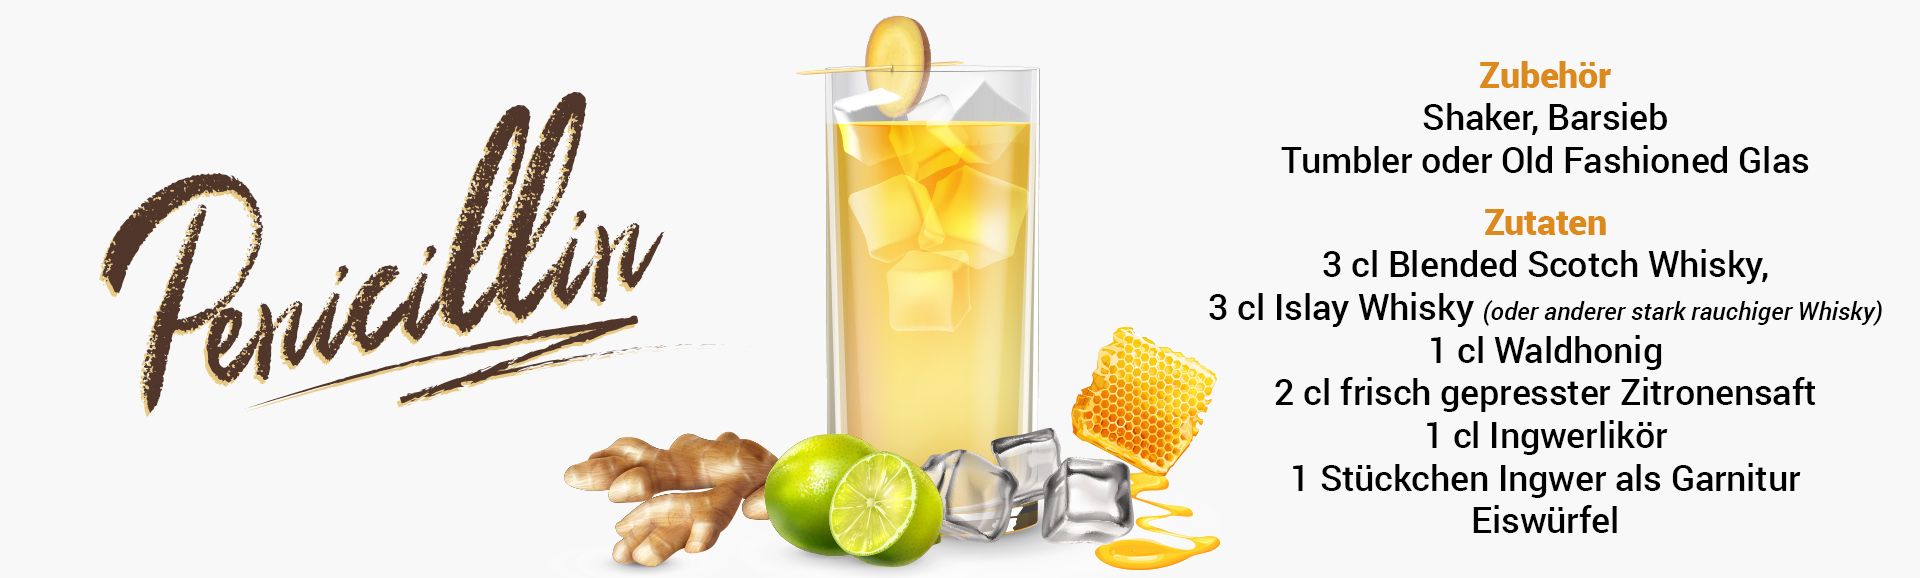 Whisky Cocktail: Penicillin Rezept + Tipp